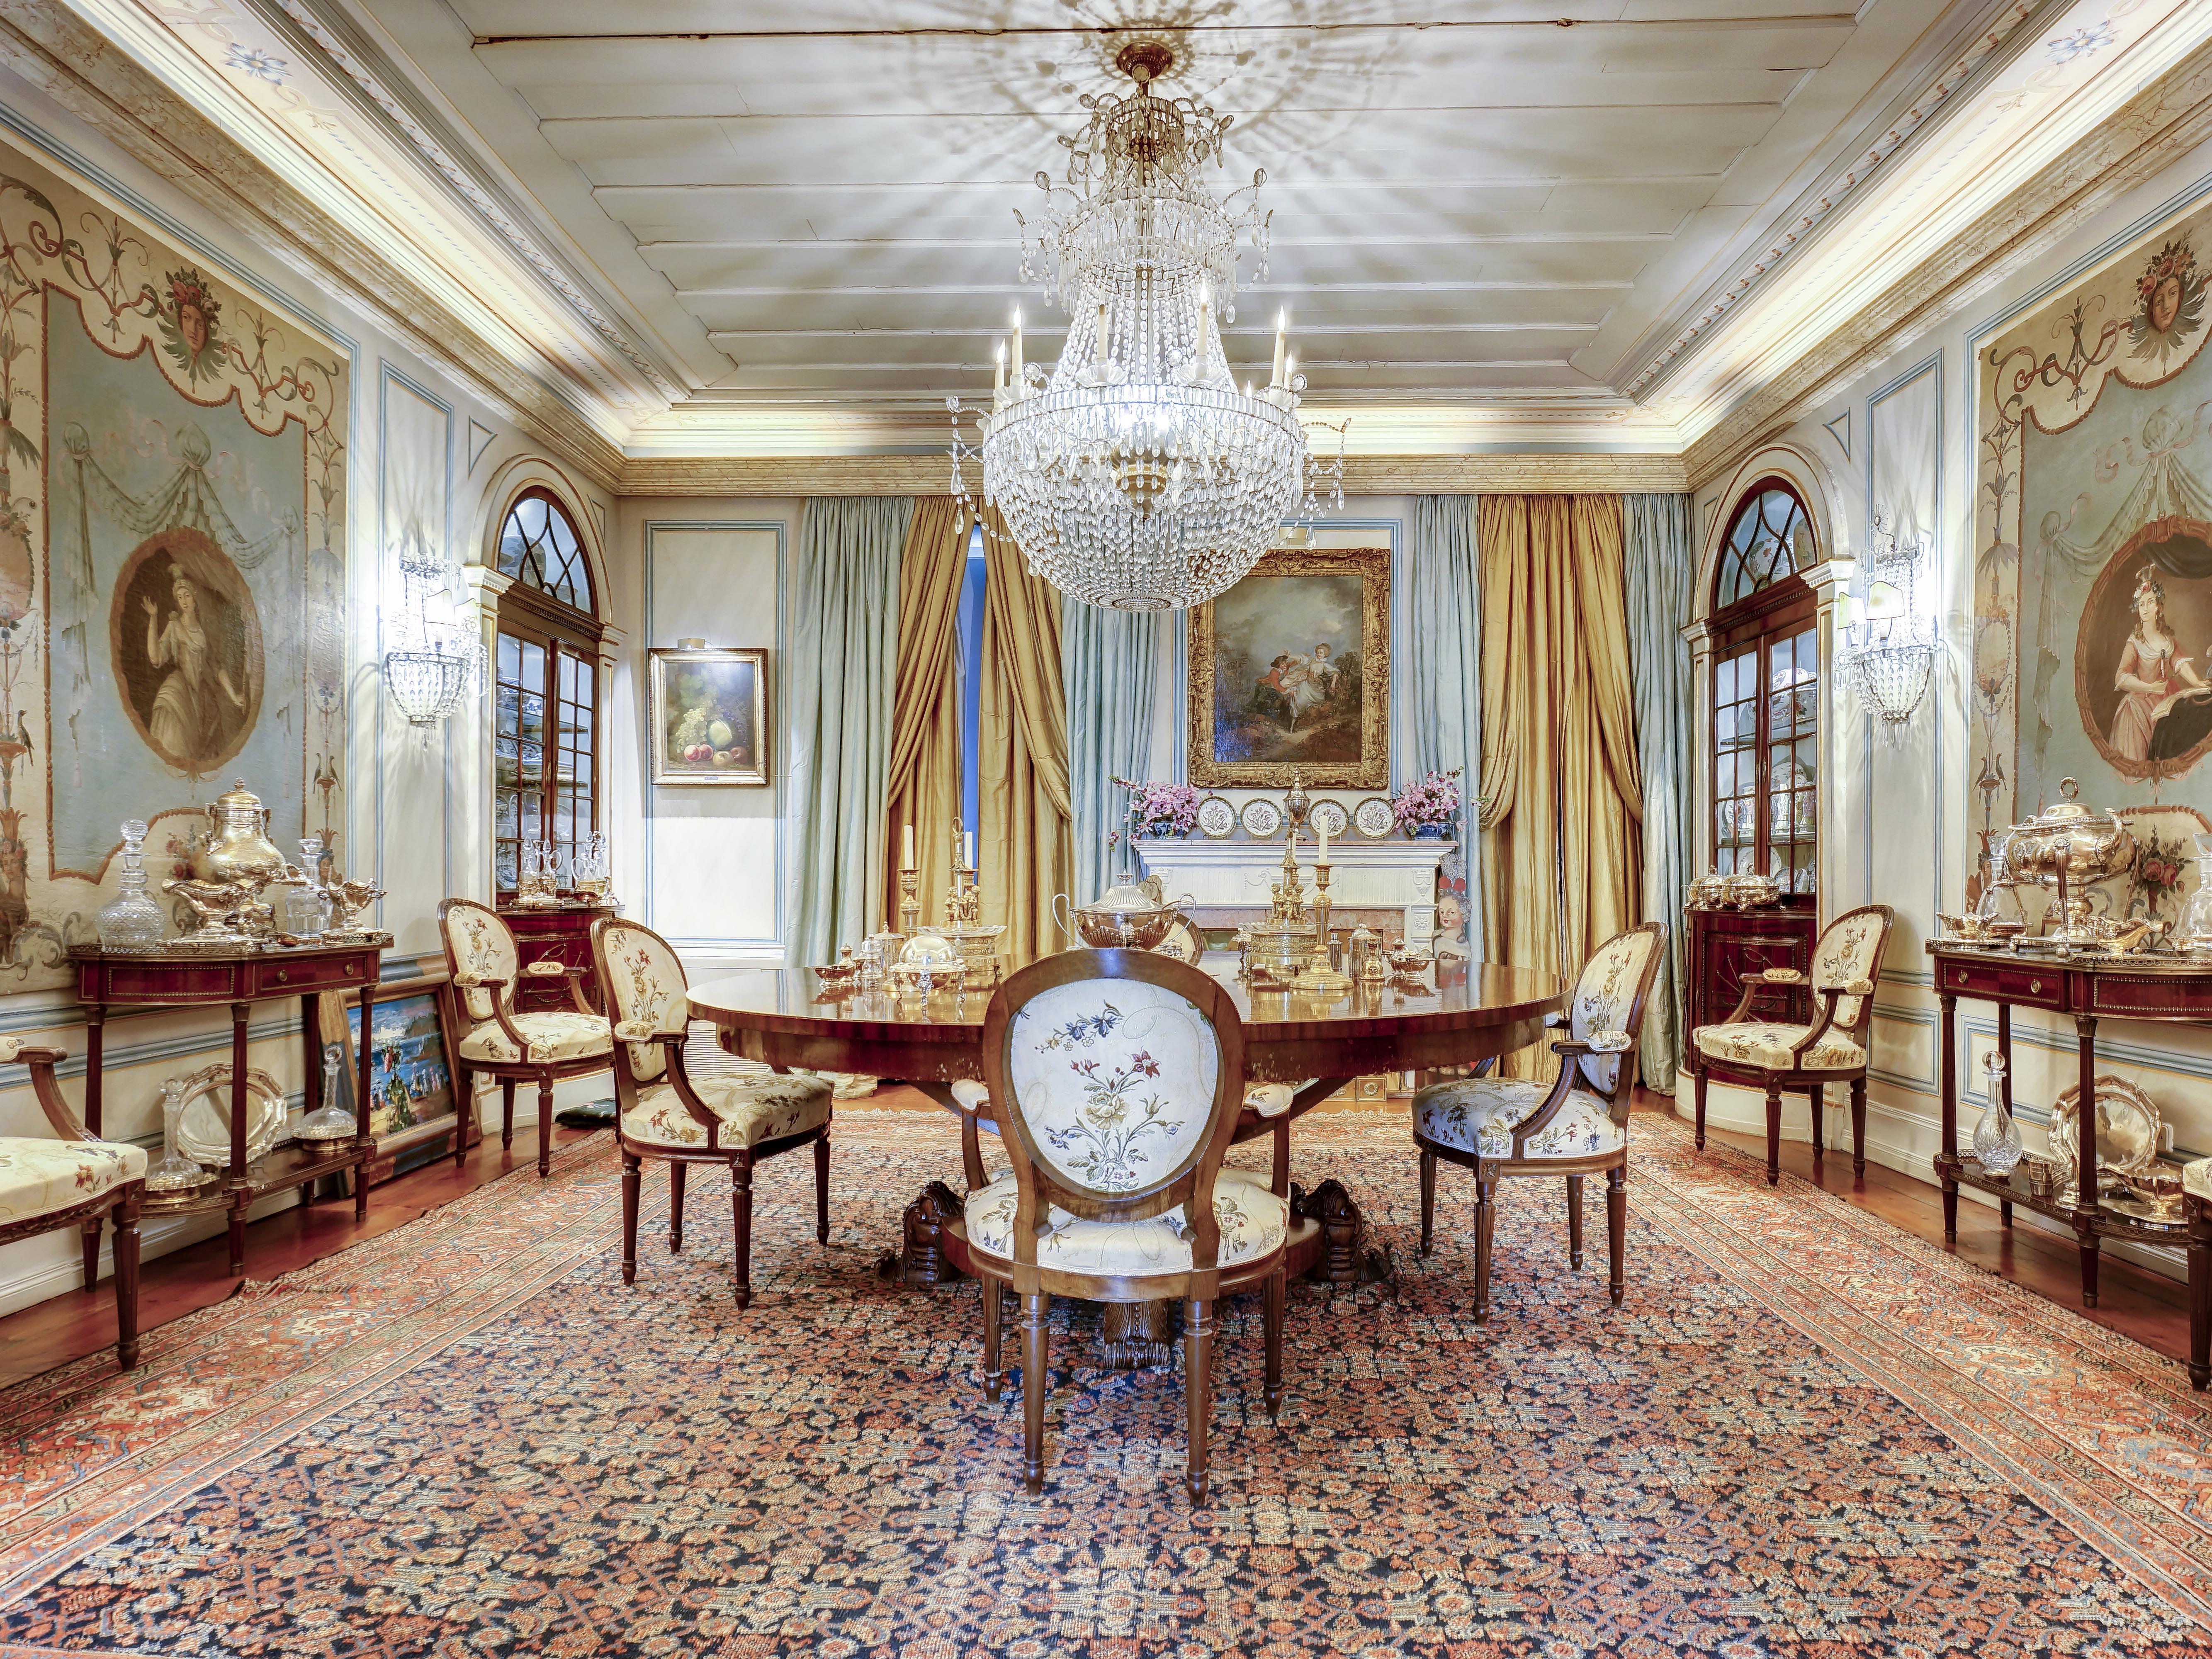 Duplex 为 销售 在 Duplex, 4 bedrooms, for Sale Lisboa, 葡京 1300-004 葡萄牙